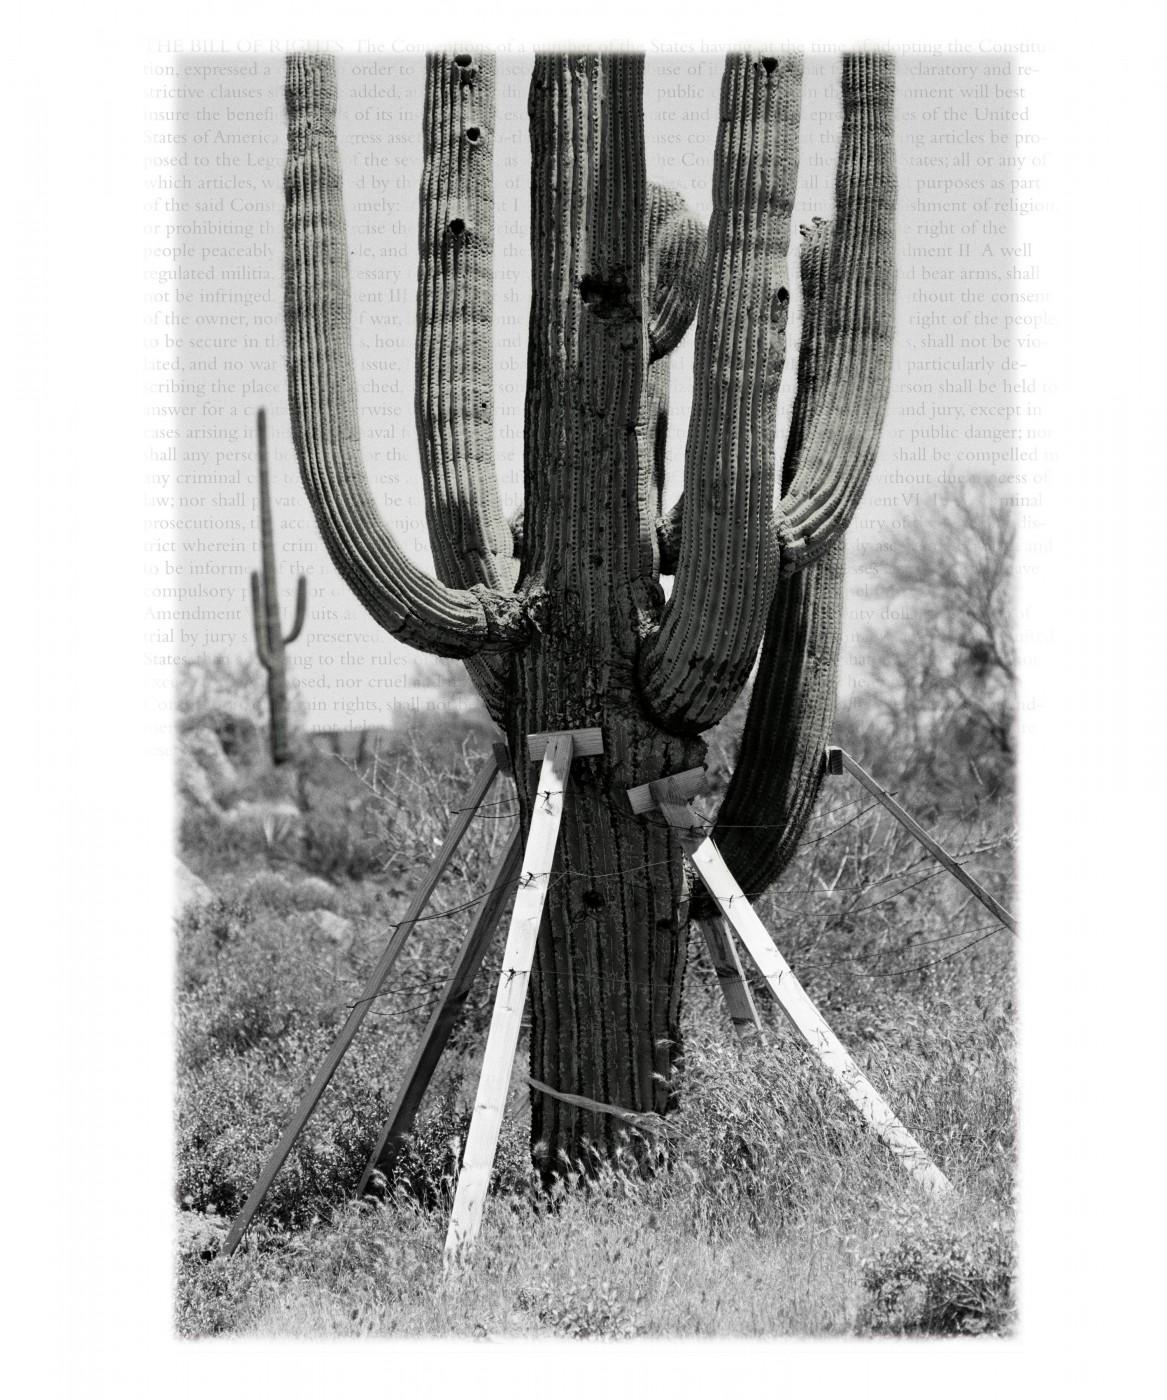 Stan Denniston, </span><span><em>Untitled, 2005-2007</em>, </span><span>6' x 4'